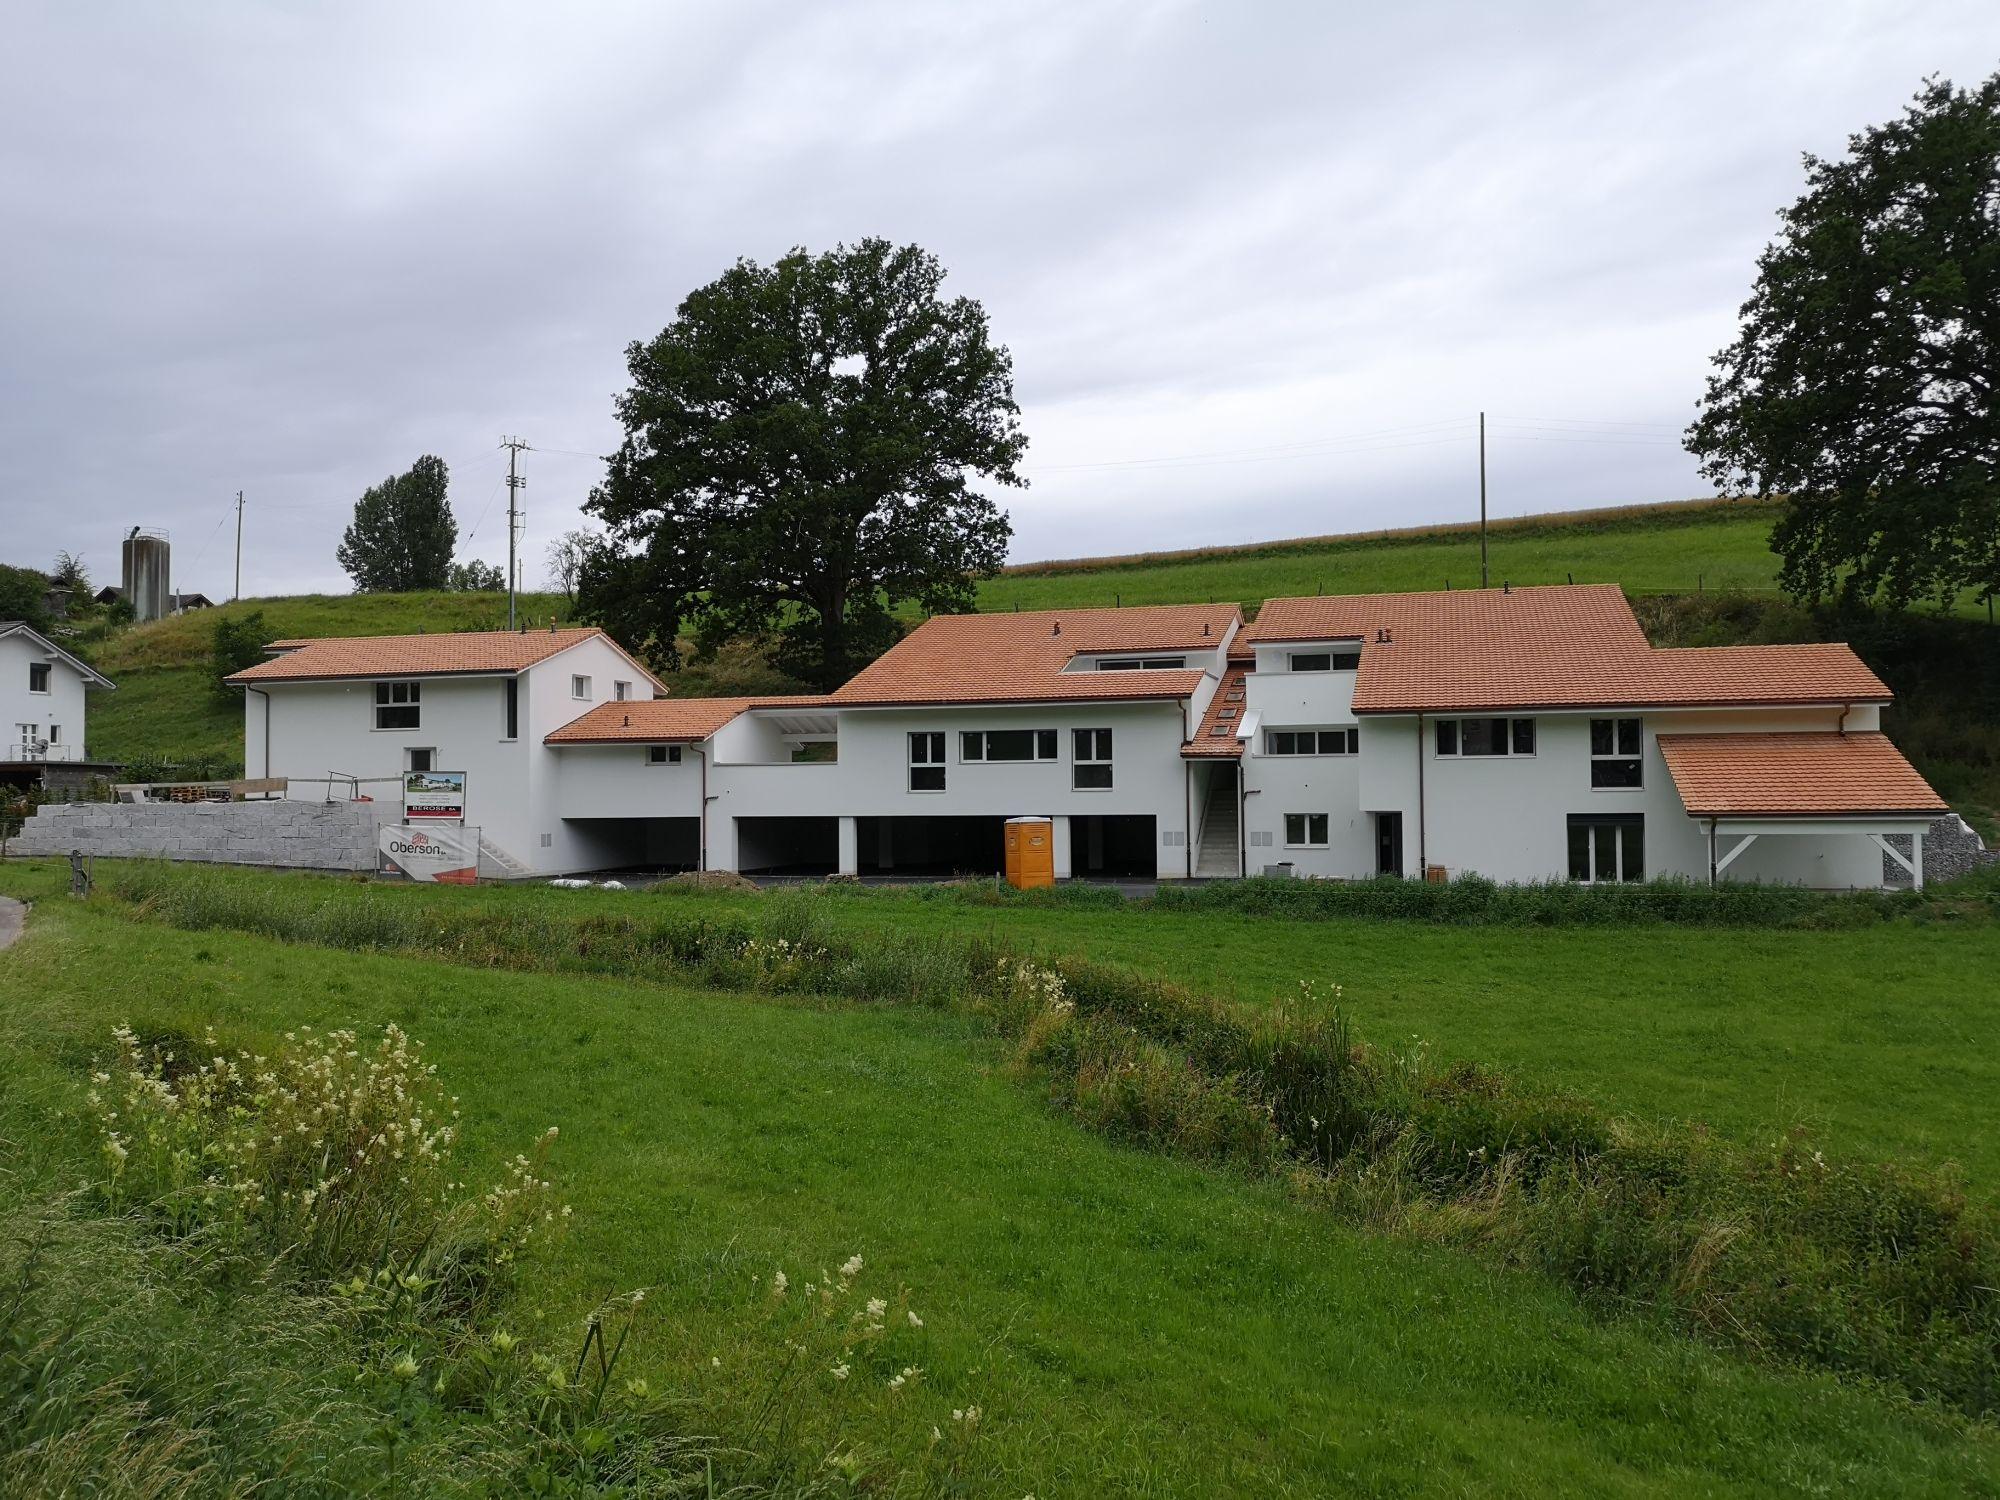 Corminboeuf - Chésopelloz